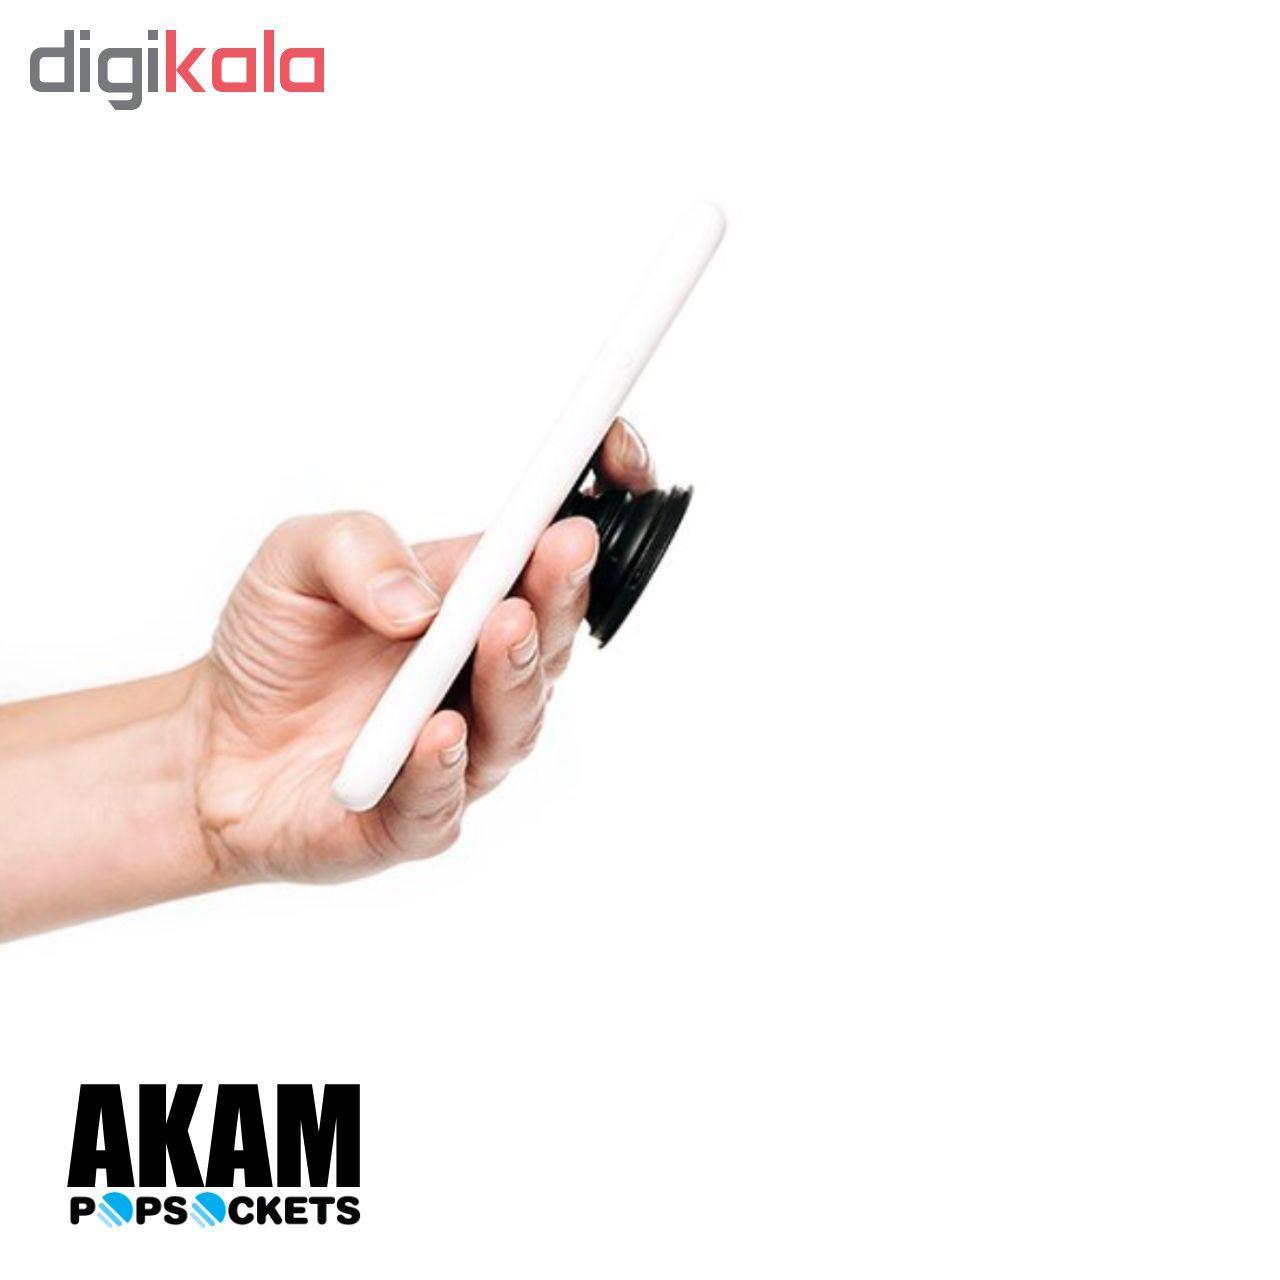 پایه نگهدارنده گوشی موبایل پاپ سوکت آکام مدل APS0021 main 1 7